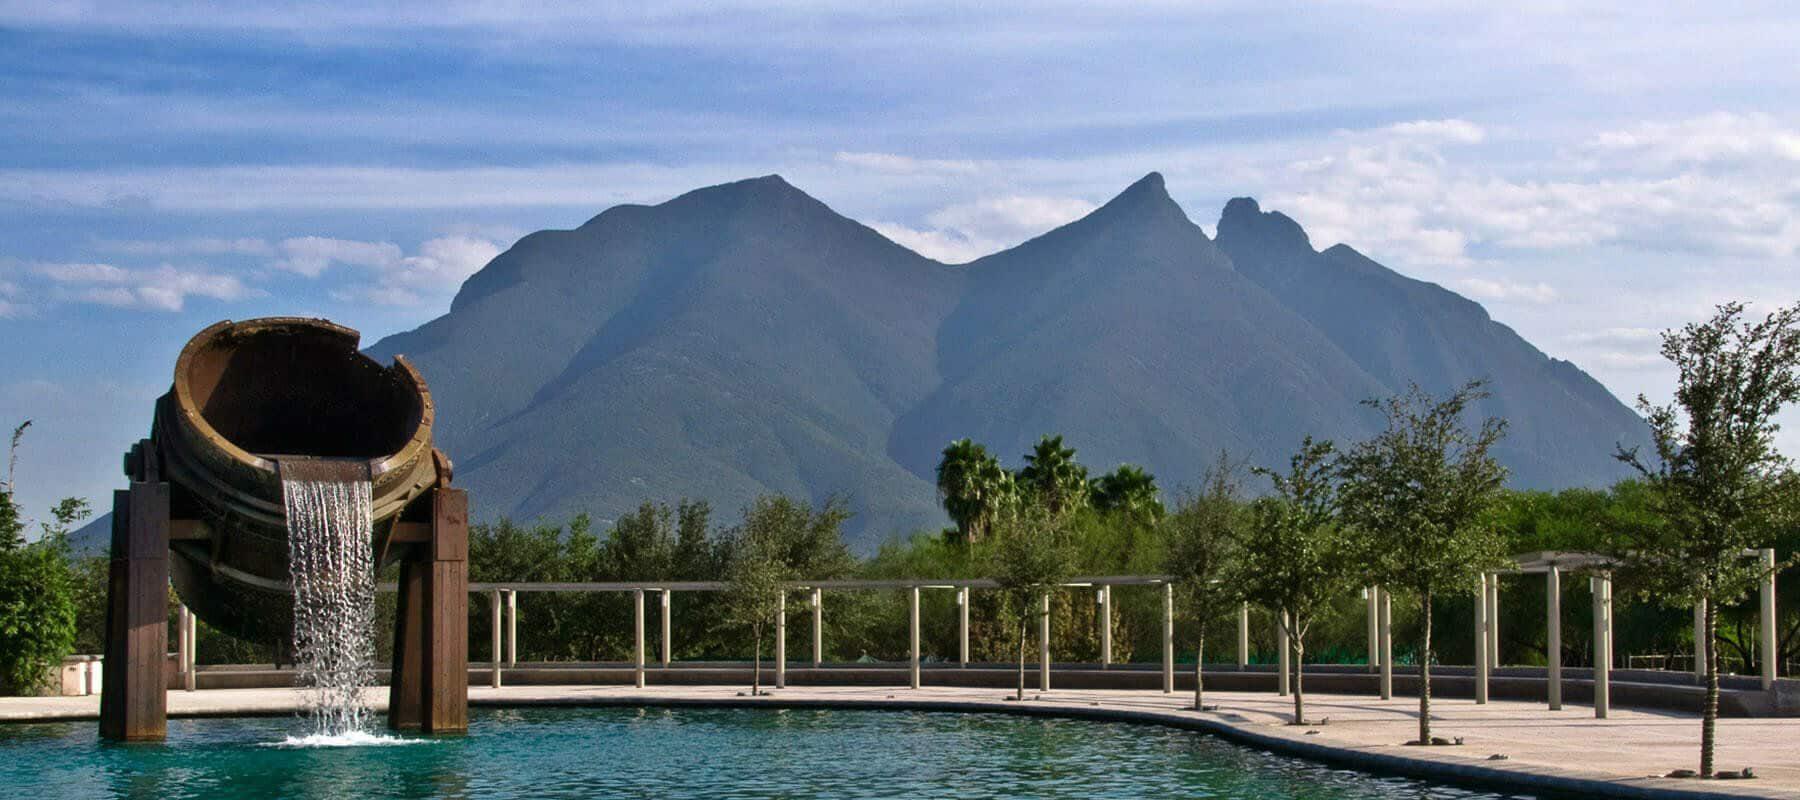 Turismo En Nuevo Leon Travel Guide